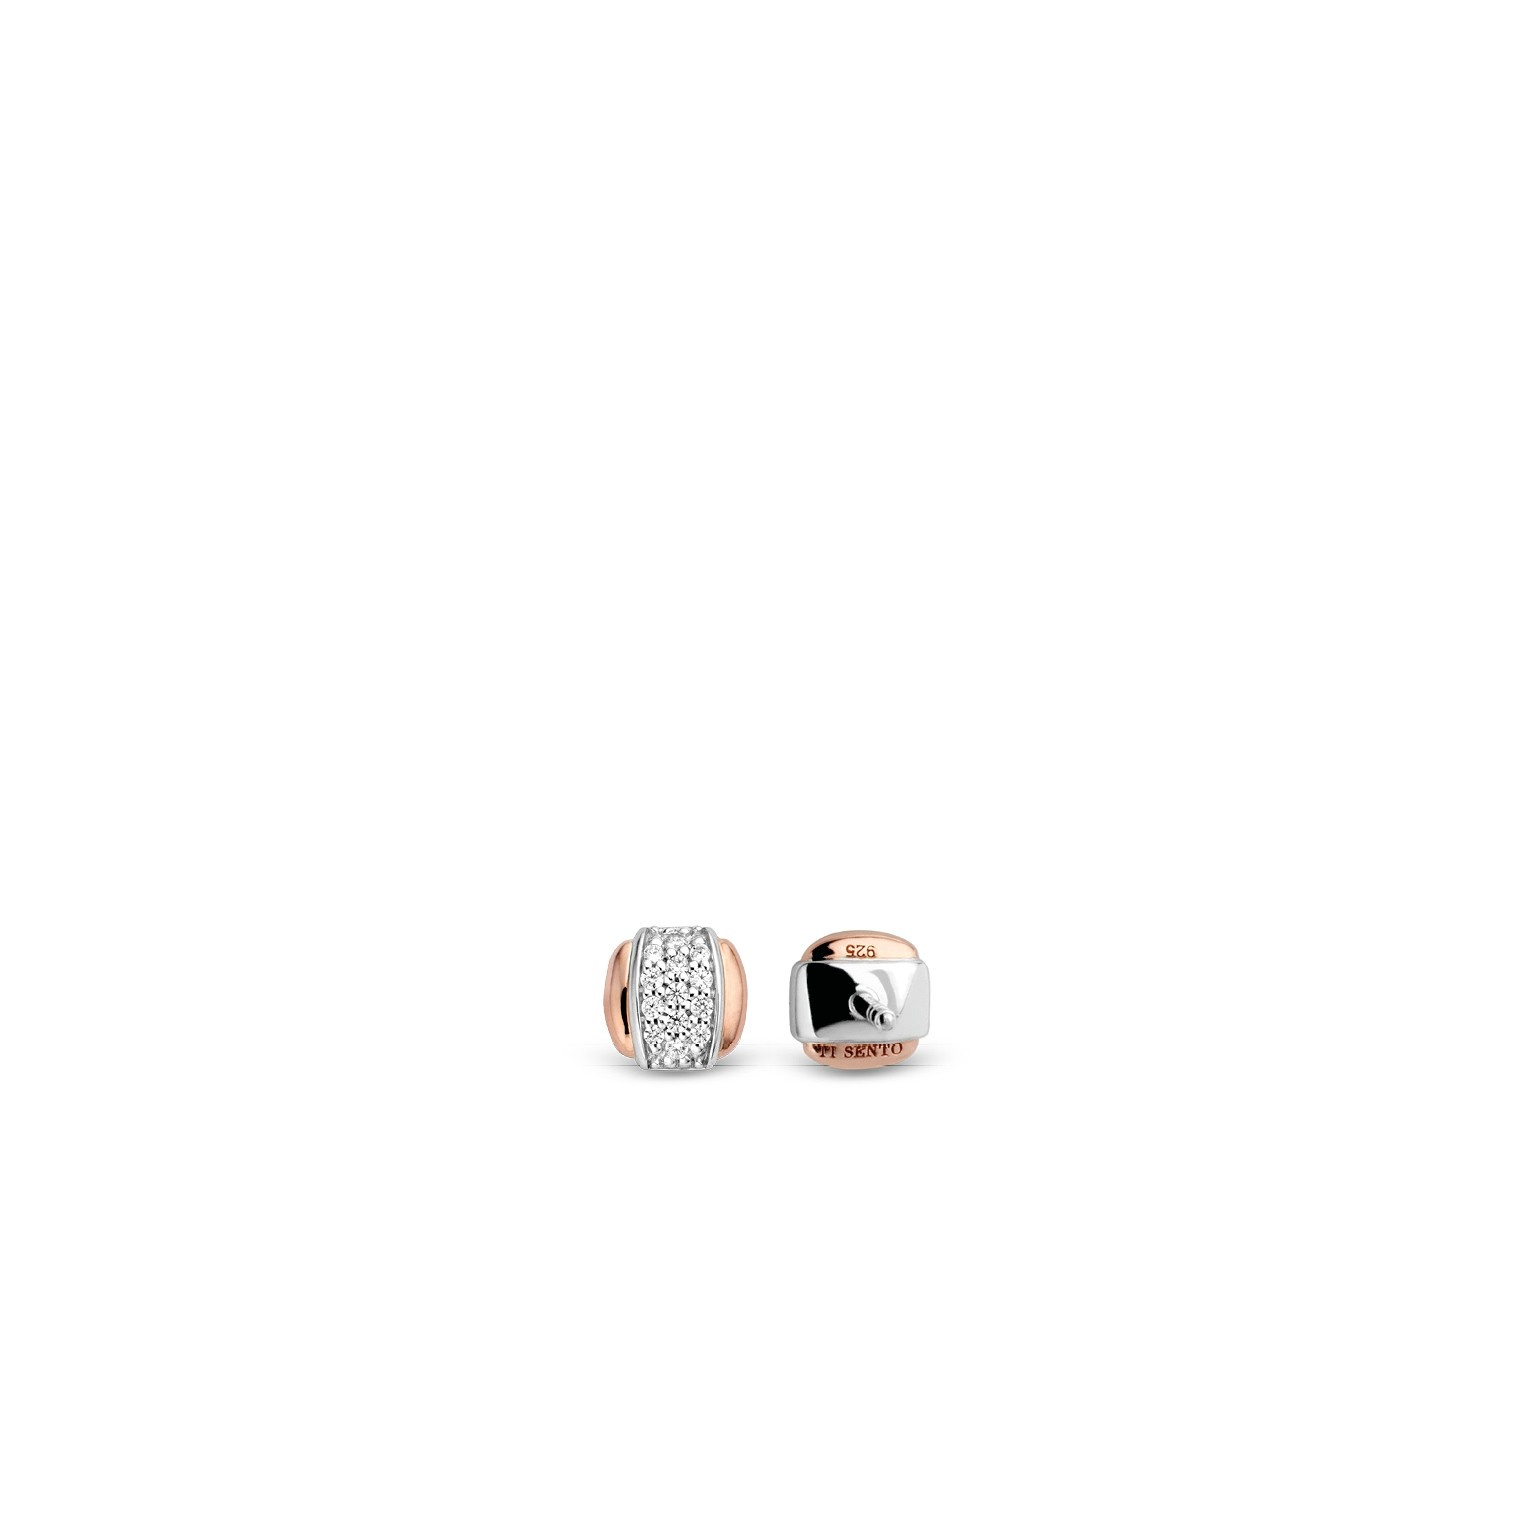 TI SENTO - Milano Earrings 7799ZR-3